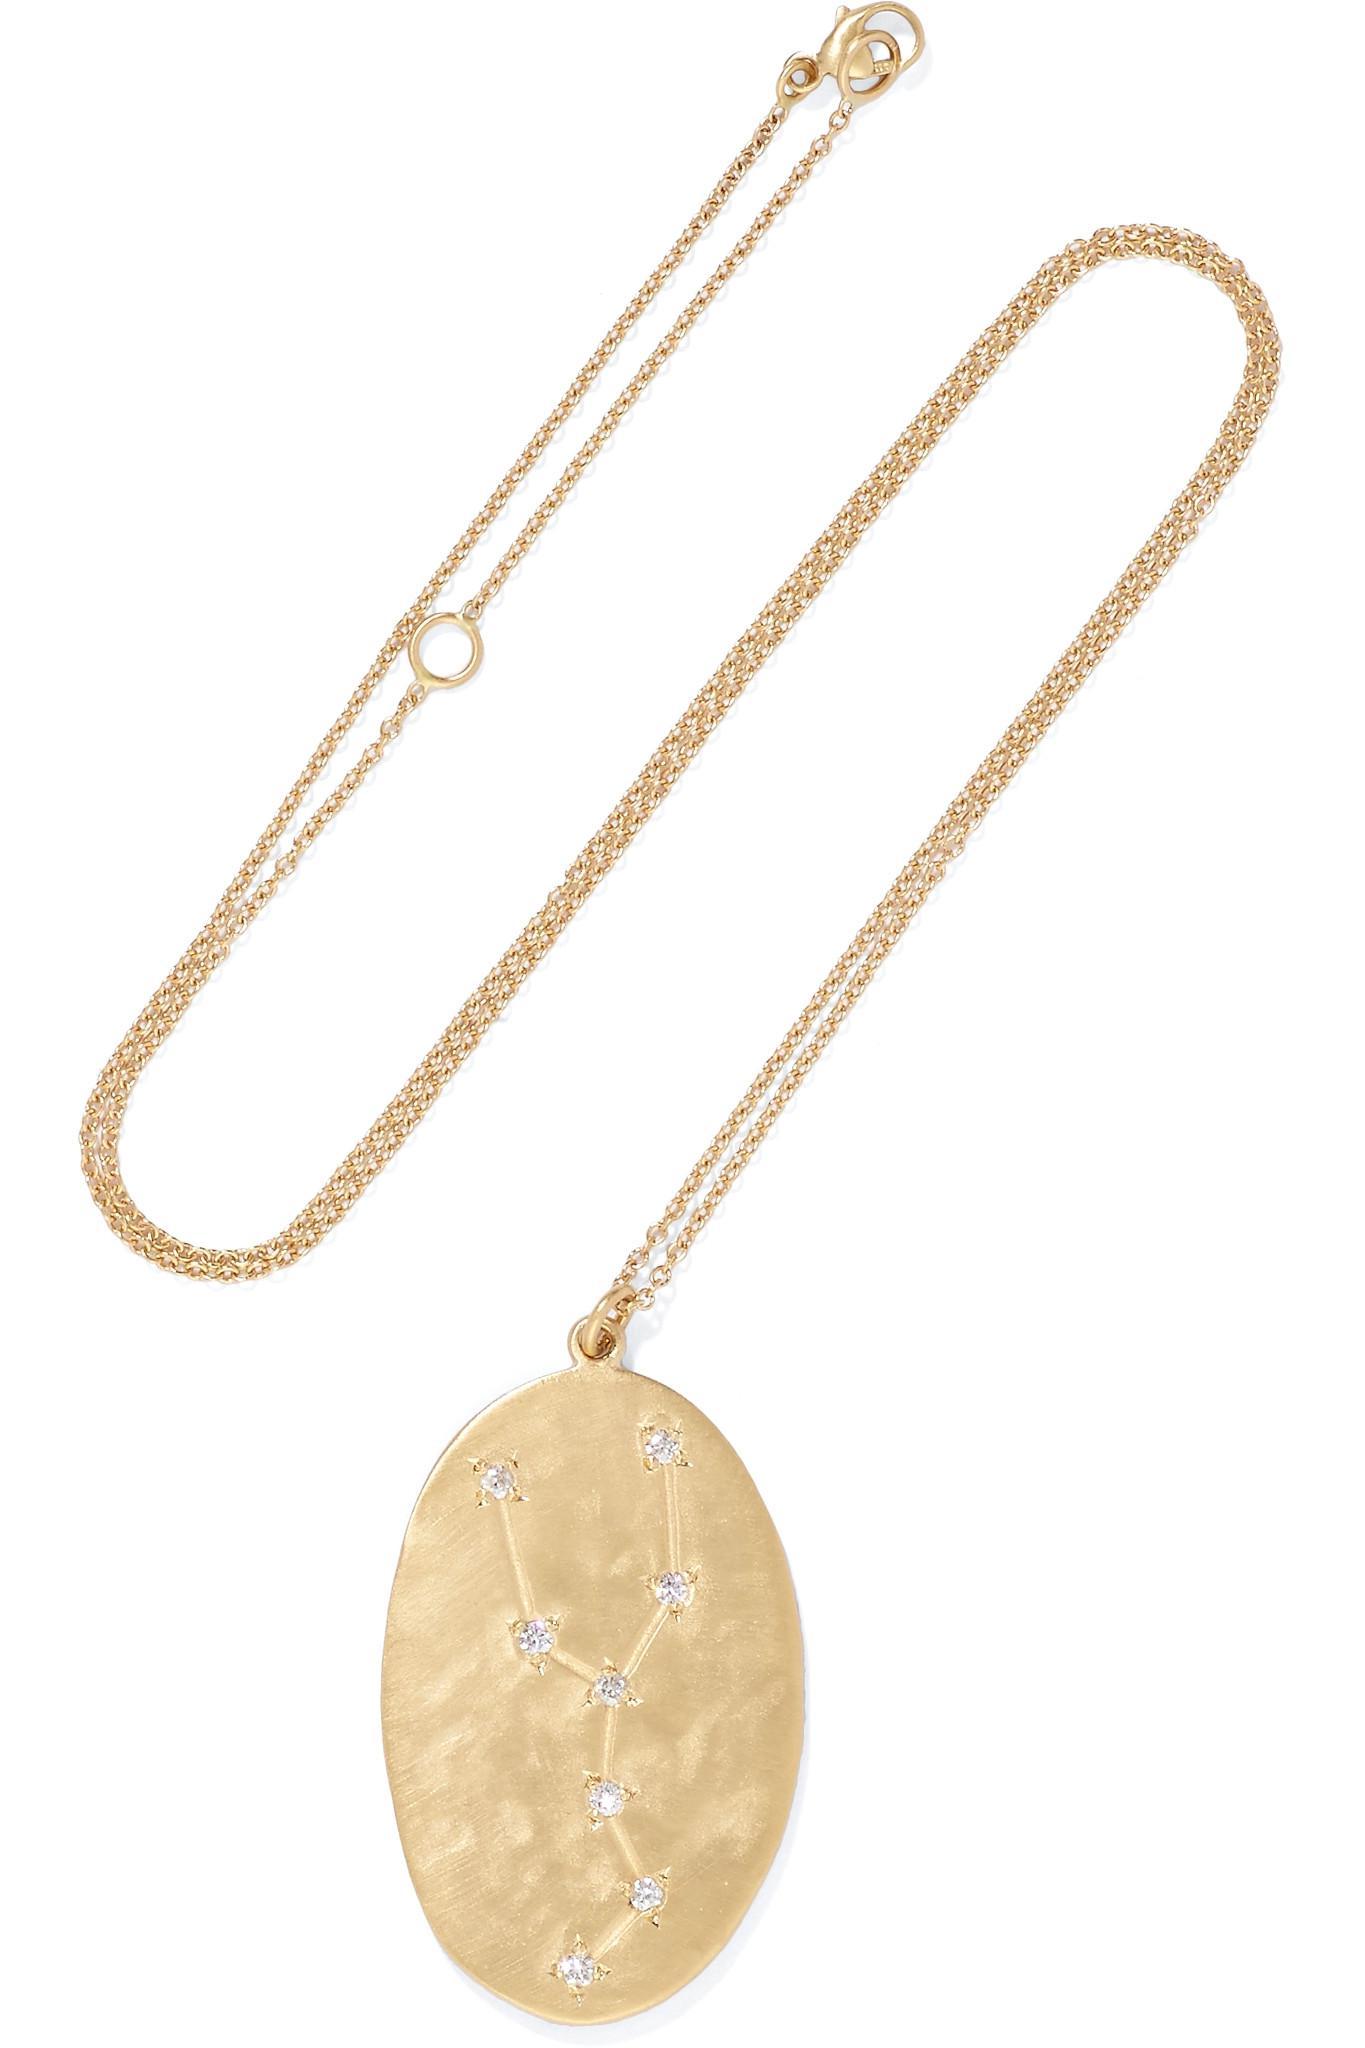 i and i jewellery 14-karat Gold Diamond Necklace Hf8wd7Bc